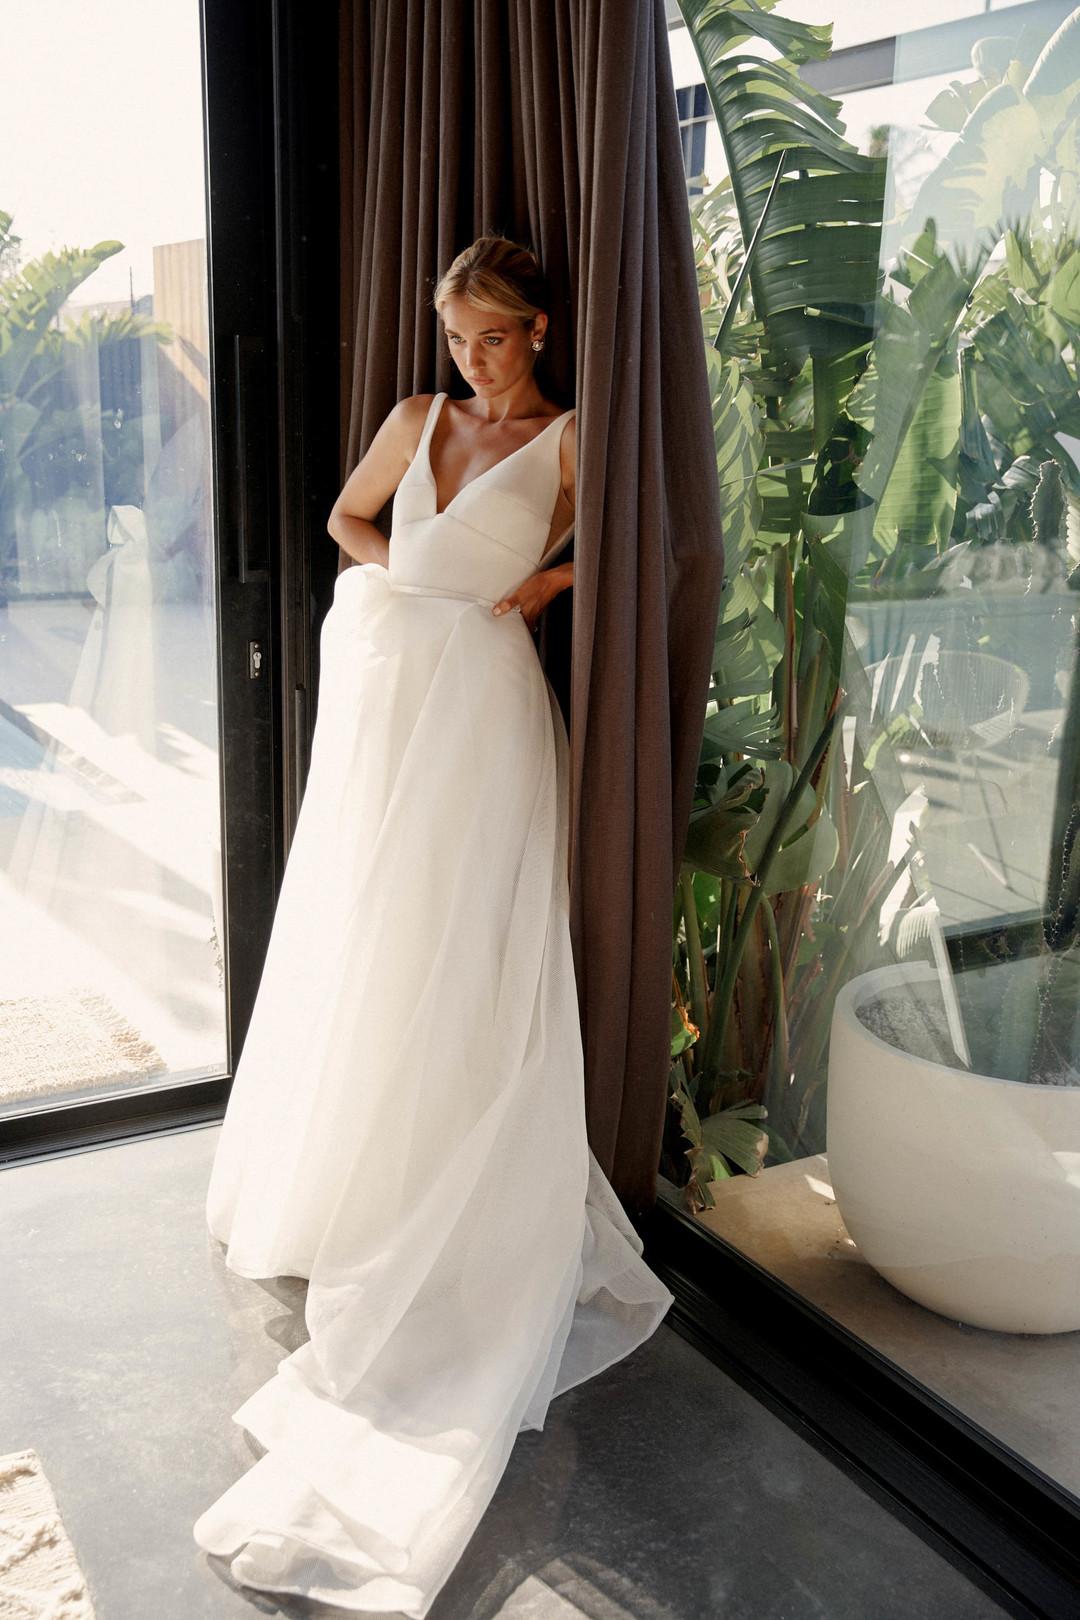 aisha dress photo